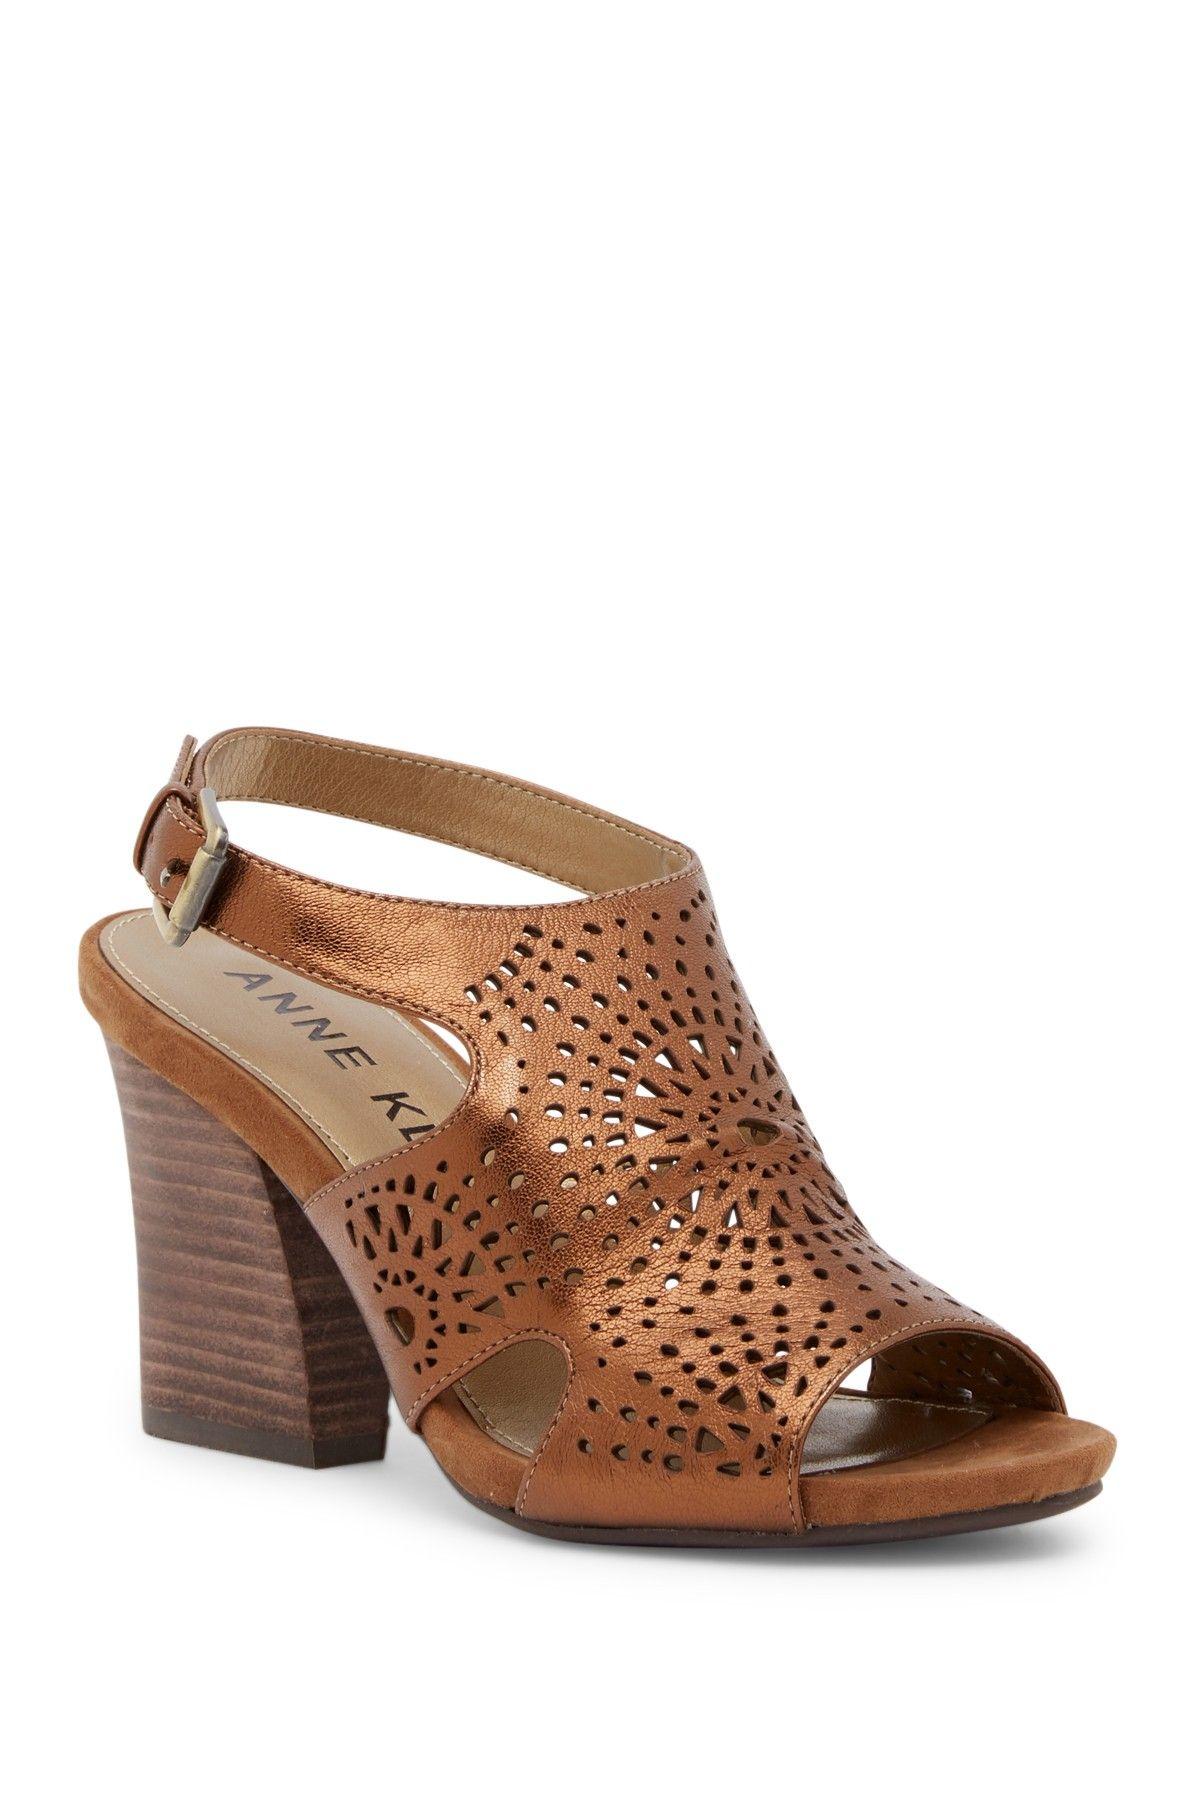 15986e17fd7 Briella Sandal   Products   Anne klein, Sandals, Nordstrom rack